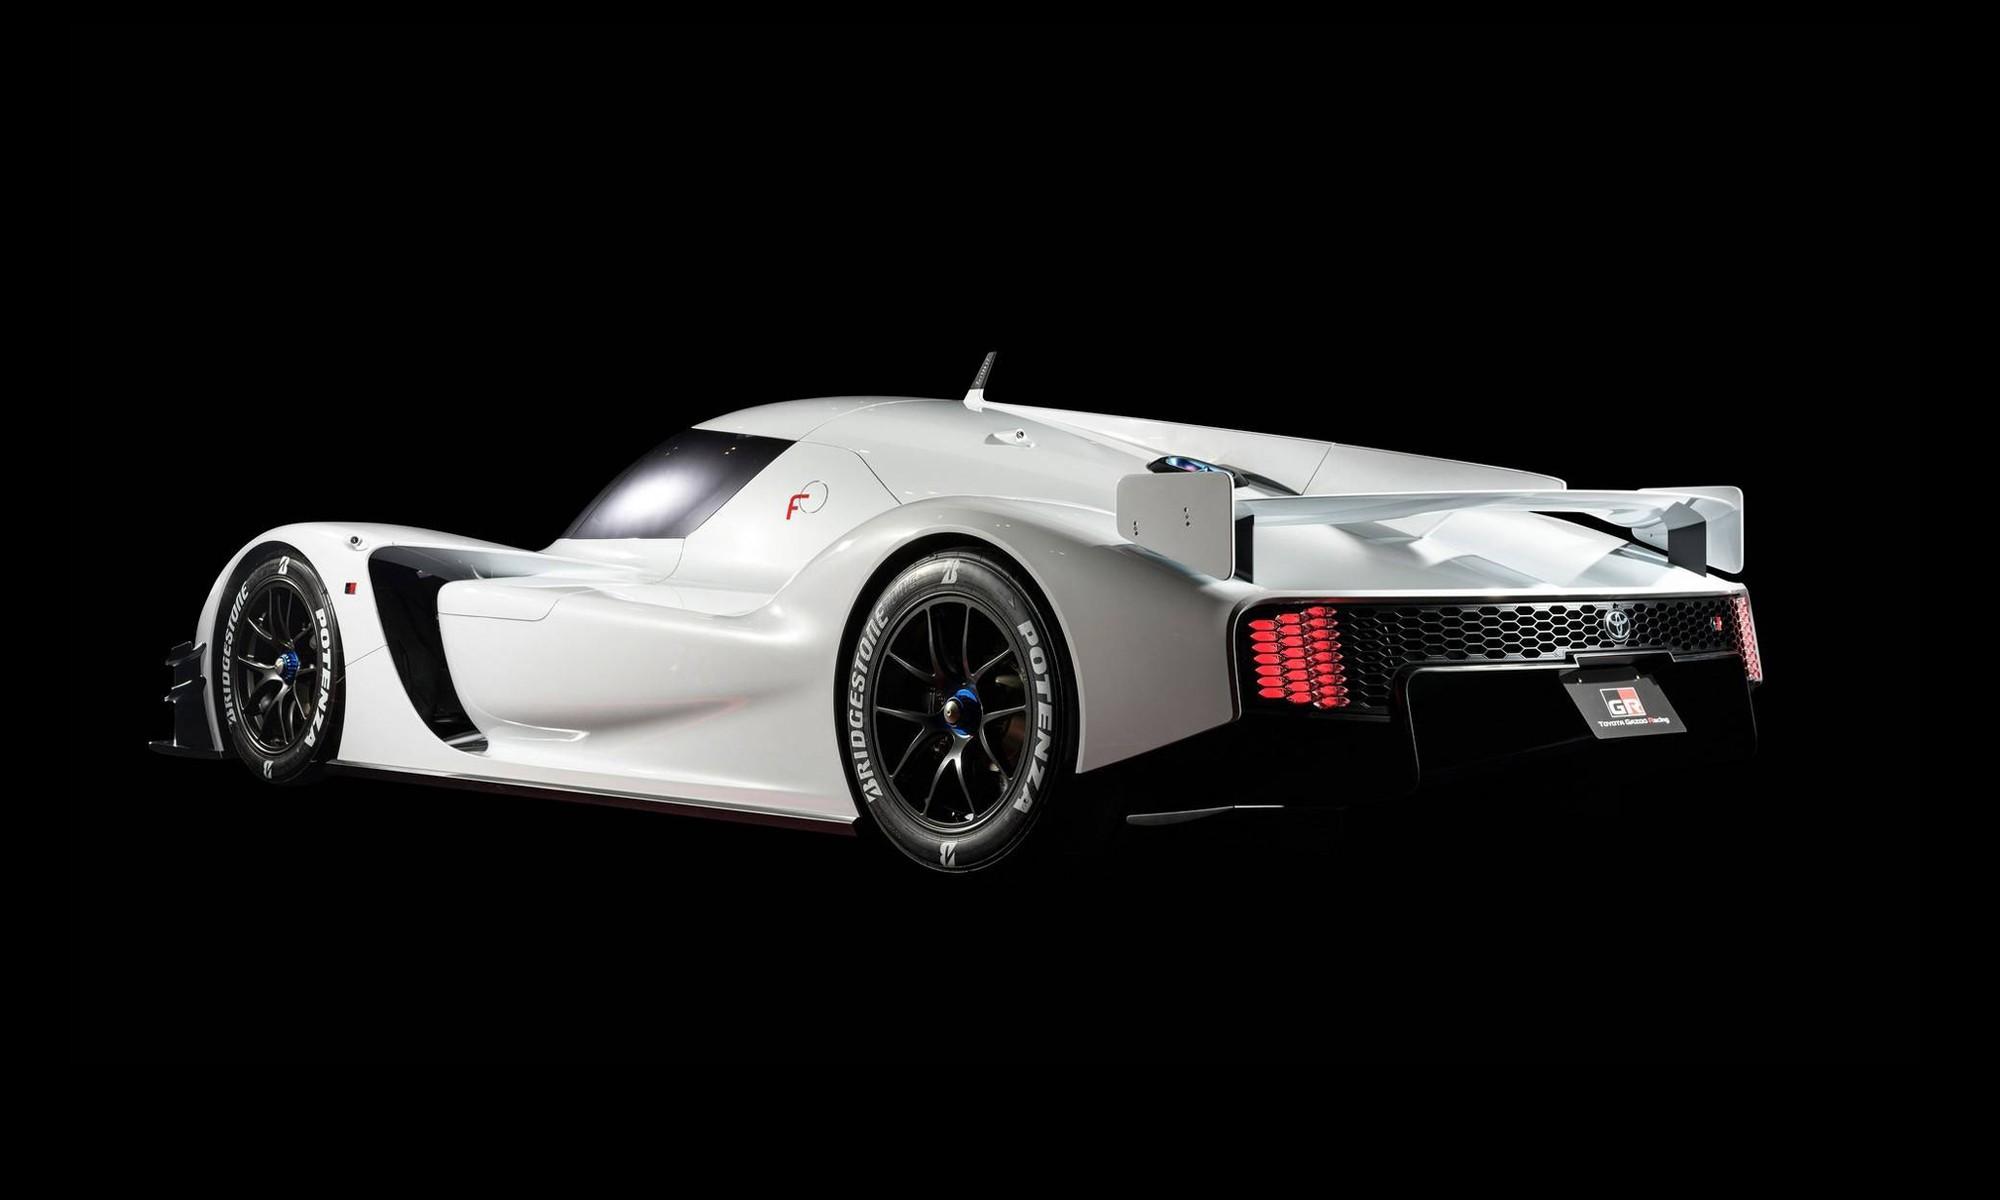 Toyota GR Super Sport rear